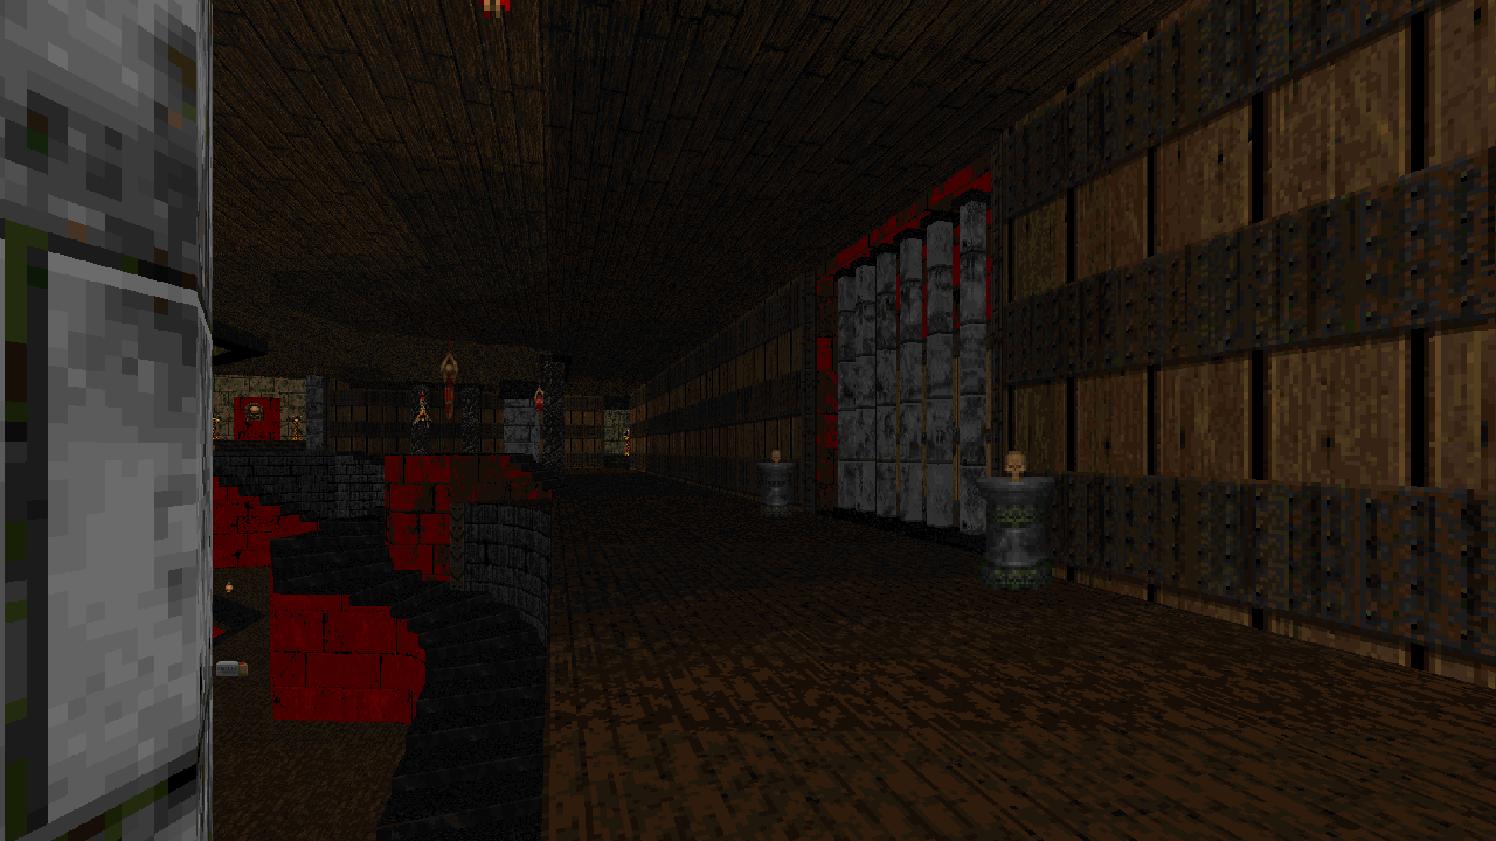 Screenshot_Doom_20190919_021044.png.db6f4c5cd6bfaf8552c999a27e8d49fe.png